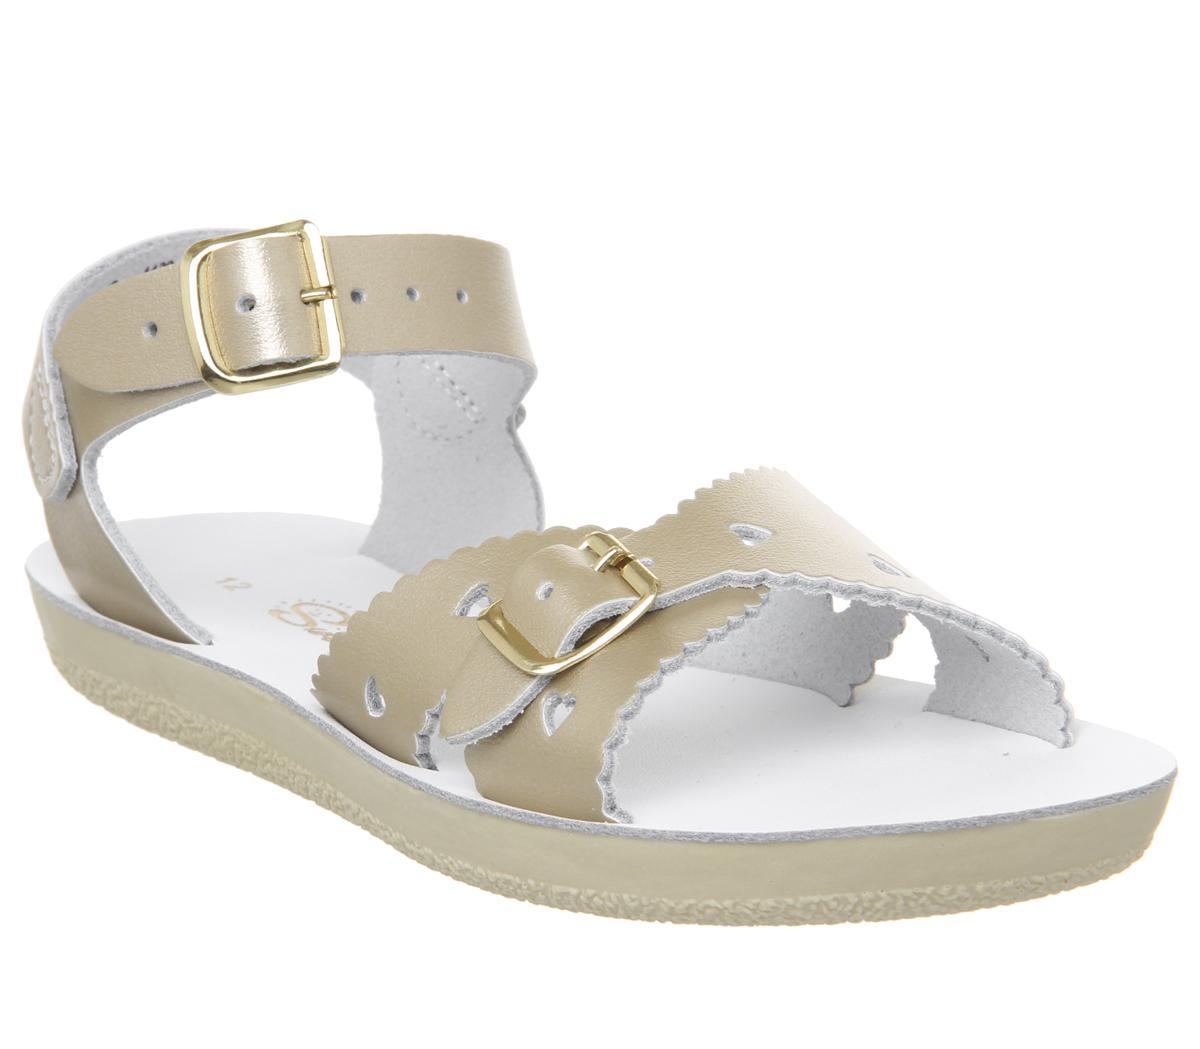 Sweetheart Sandals